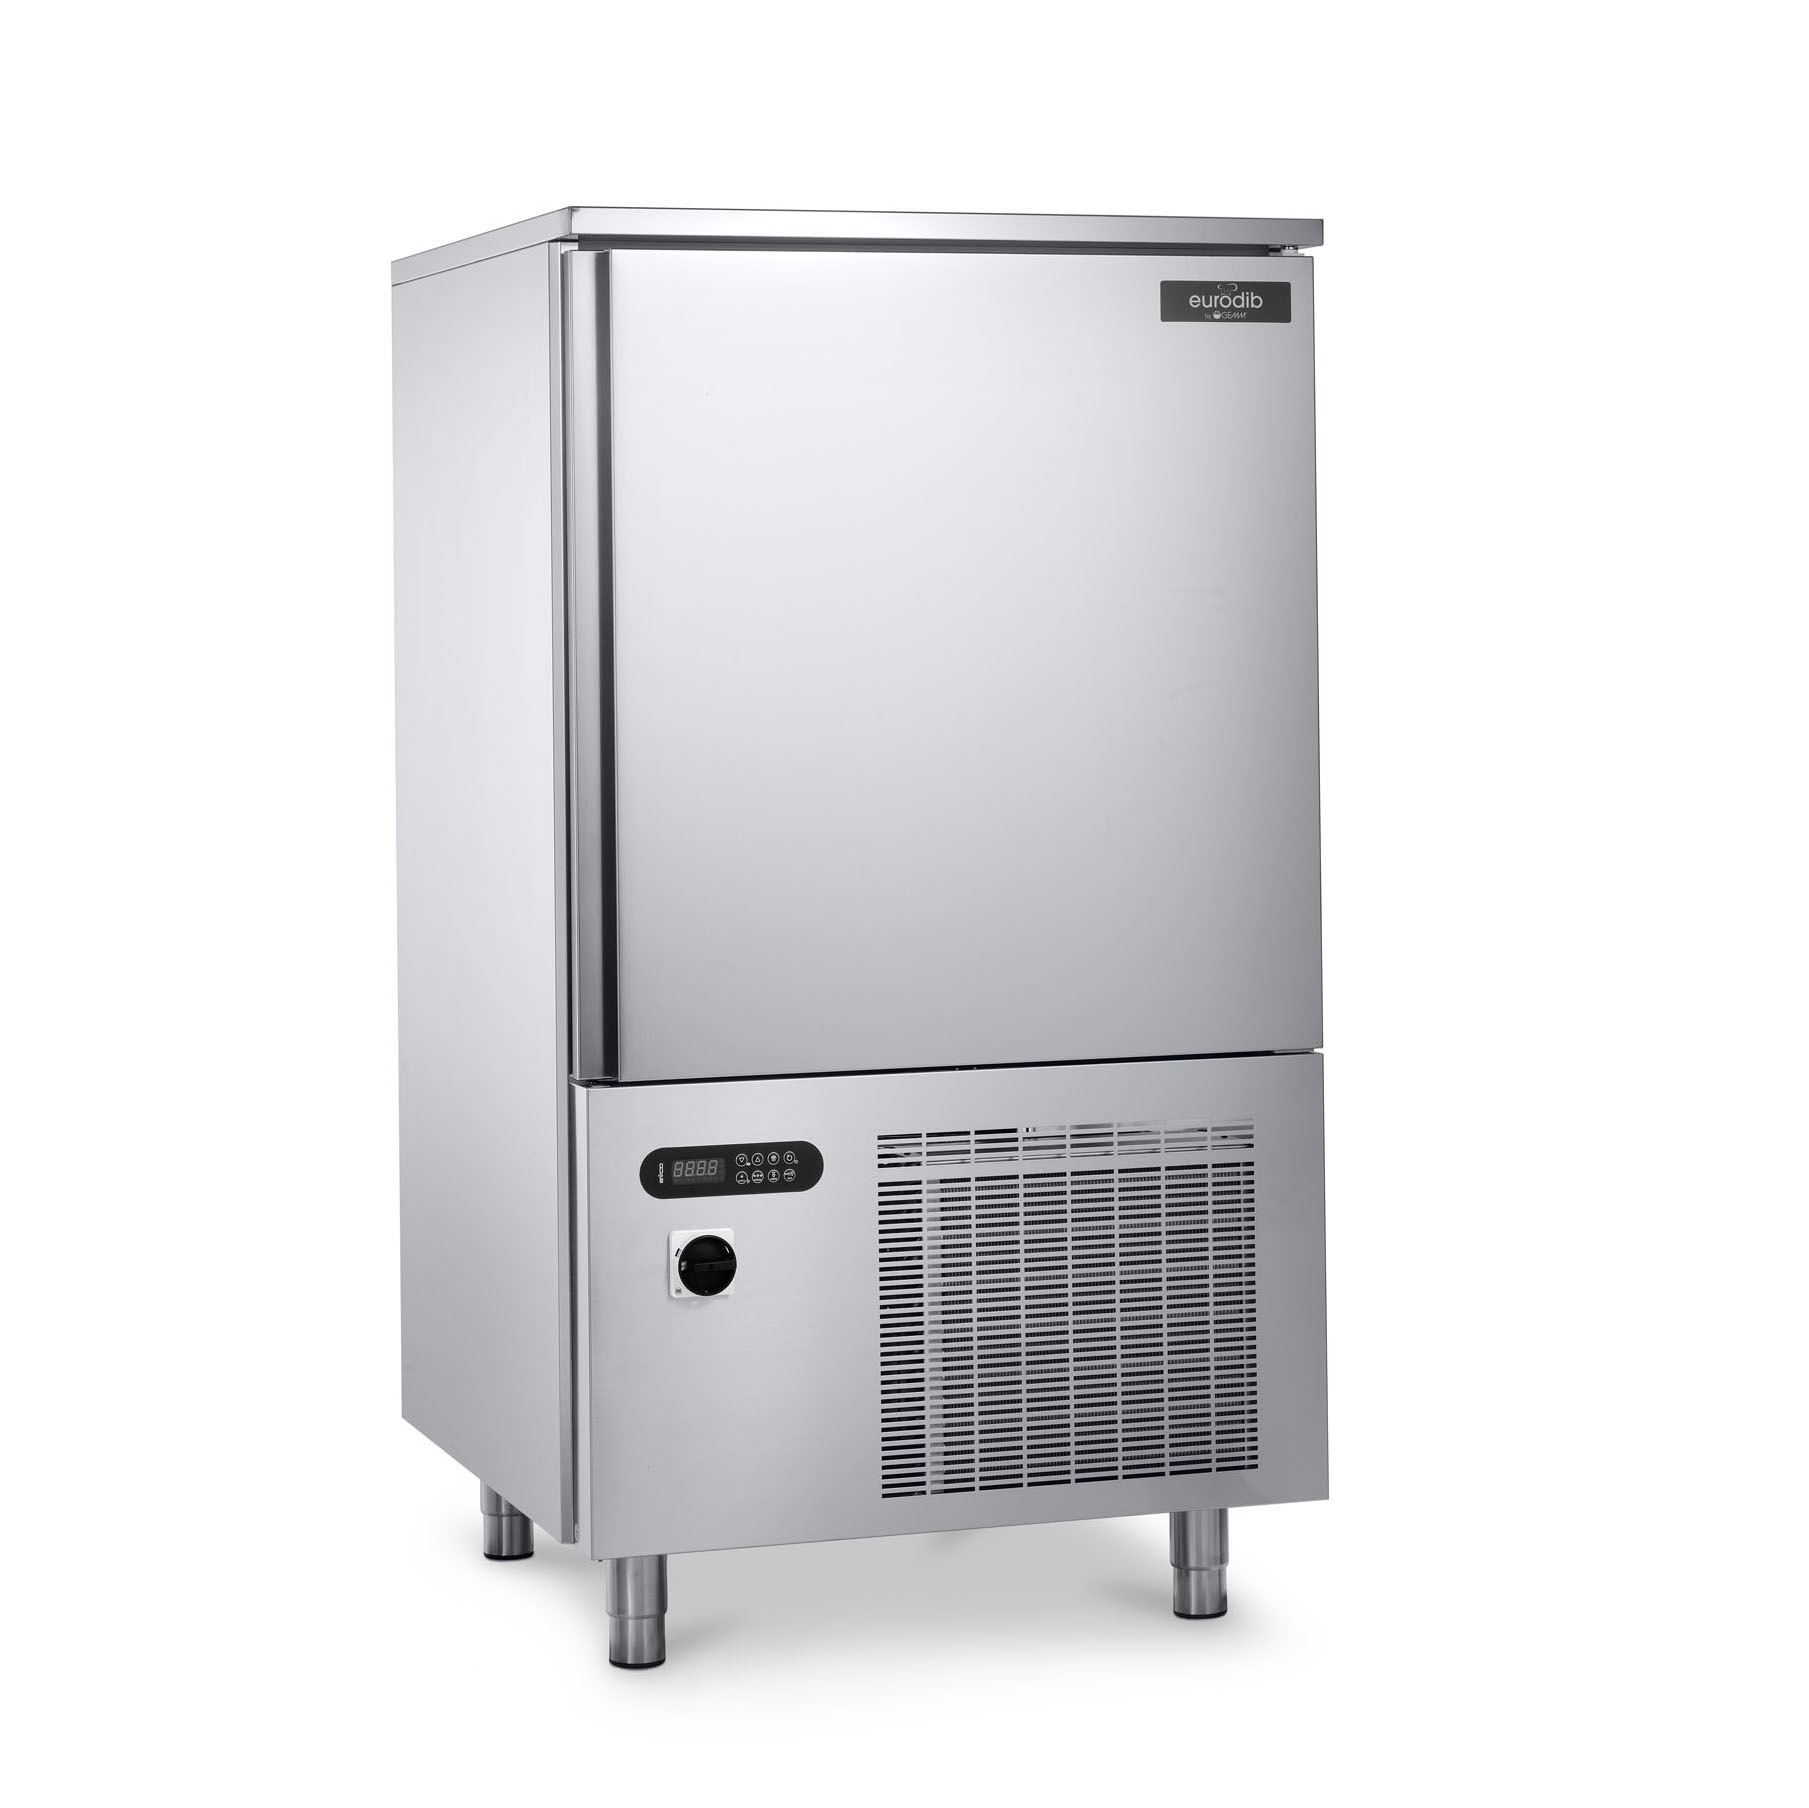 Eurodib USA BCB10US blast chiller freezer, reach-in